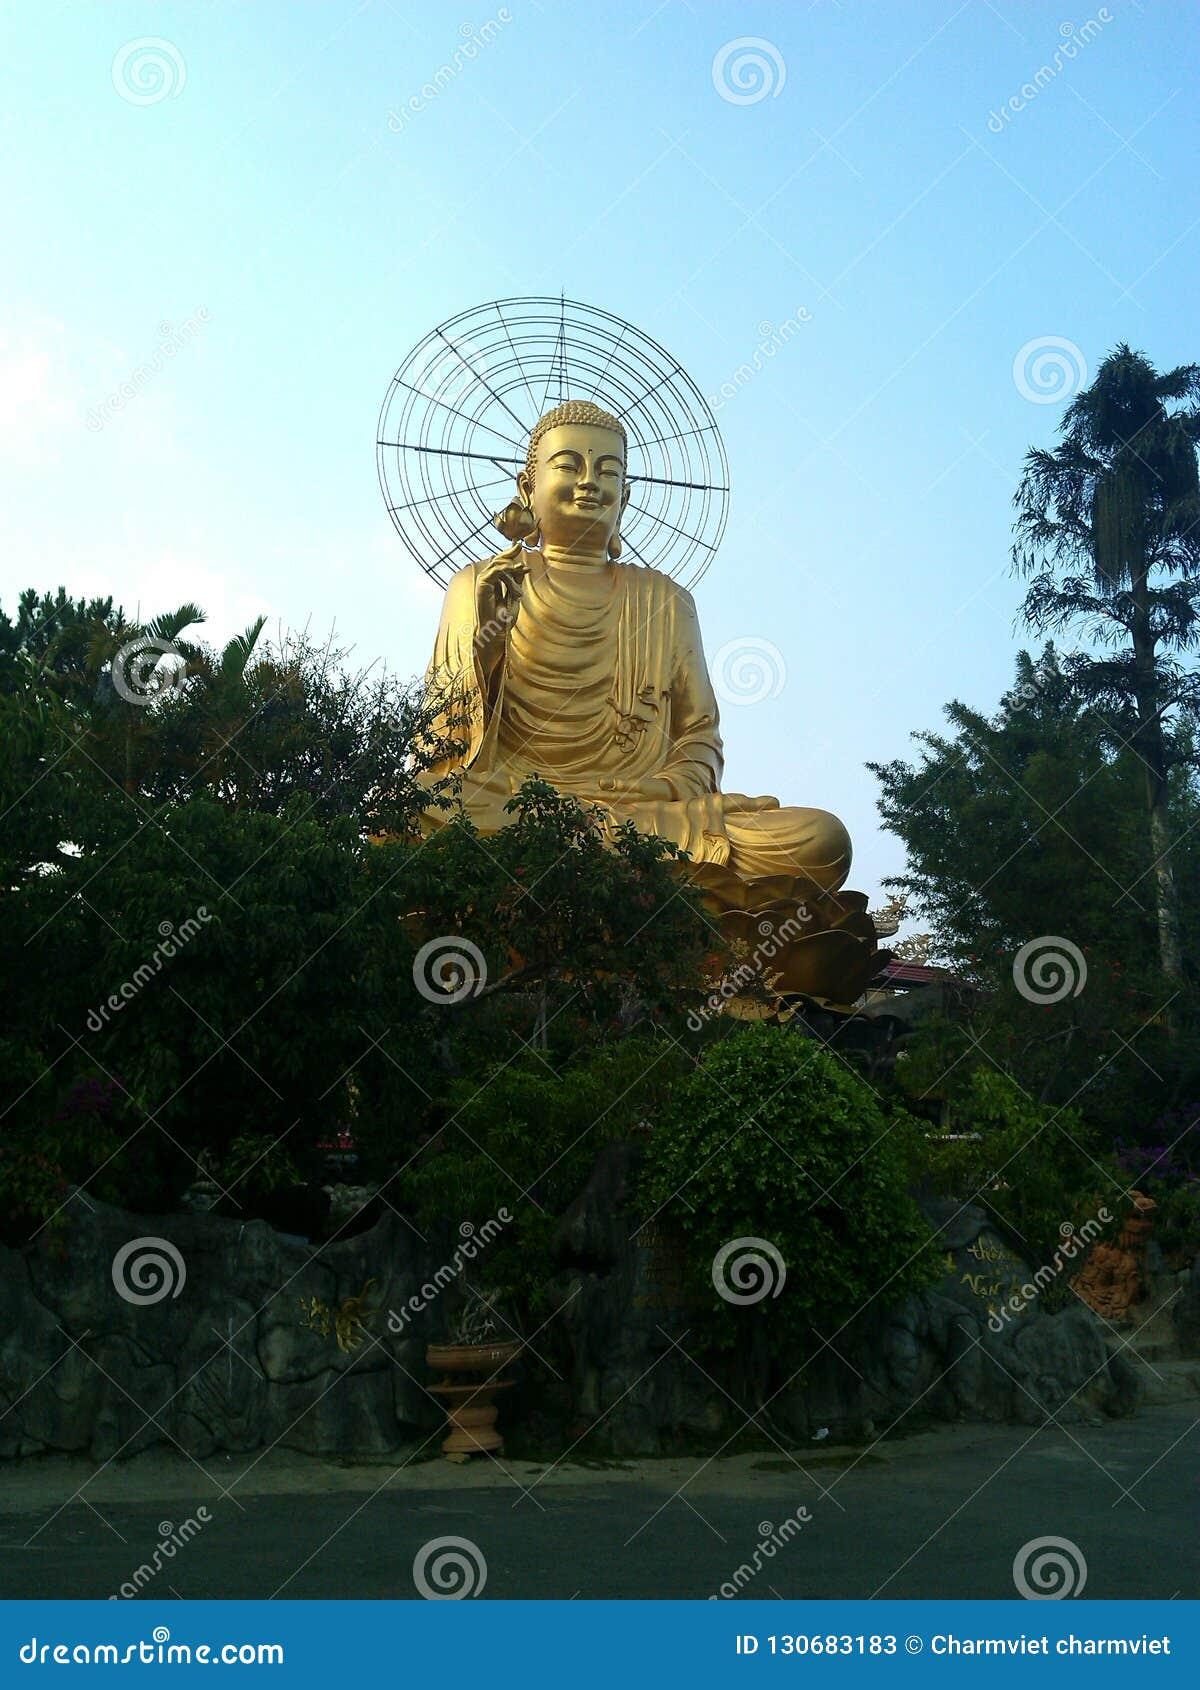 Budism-Statue